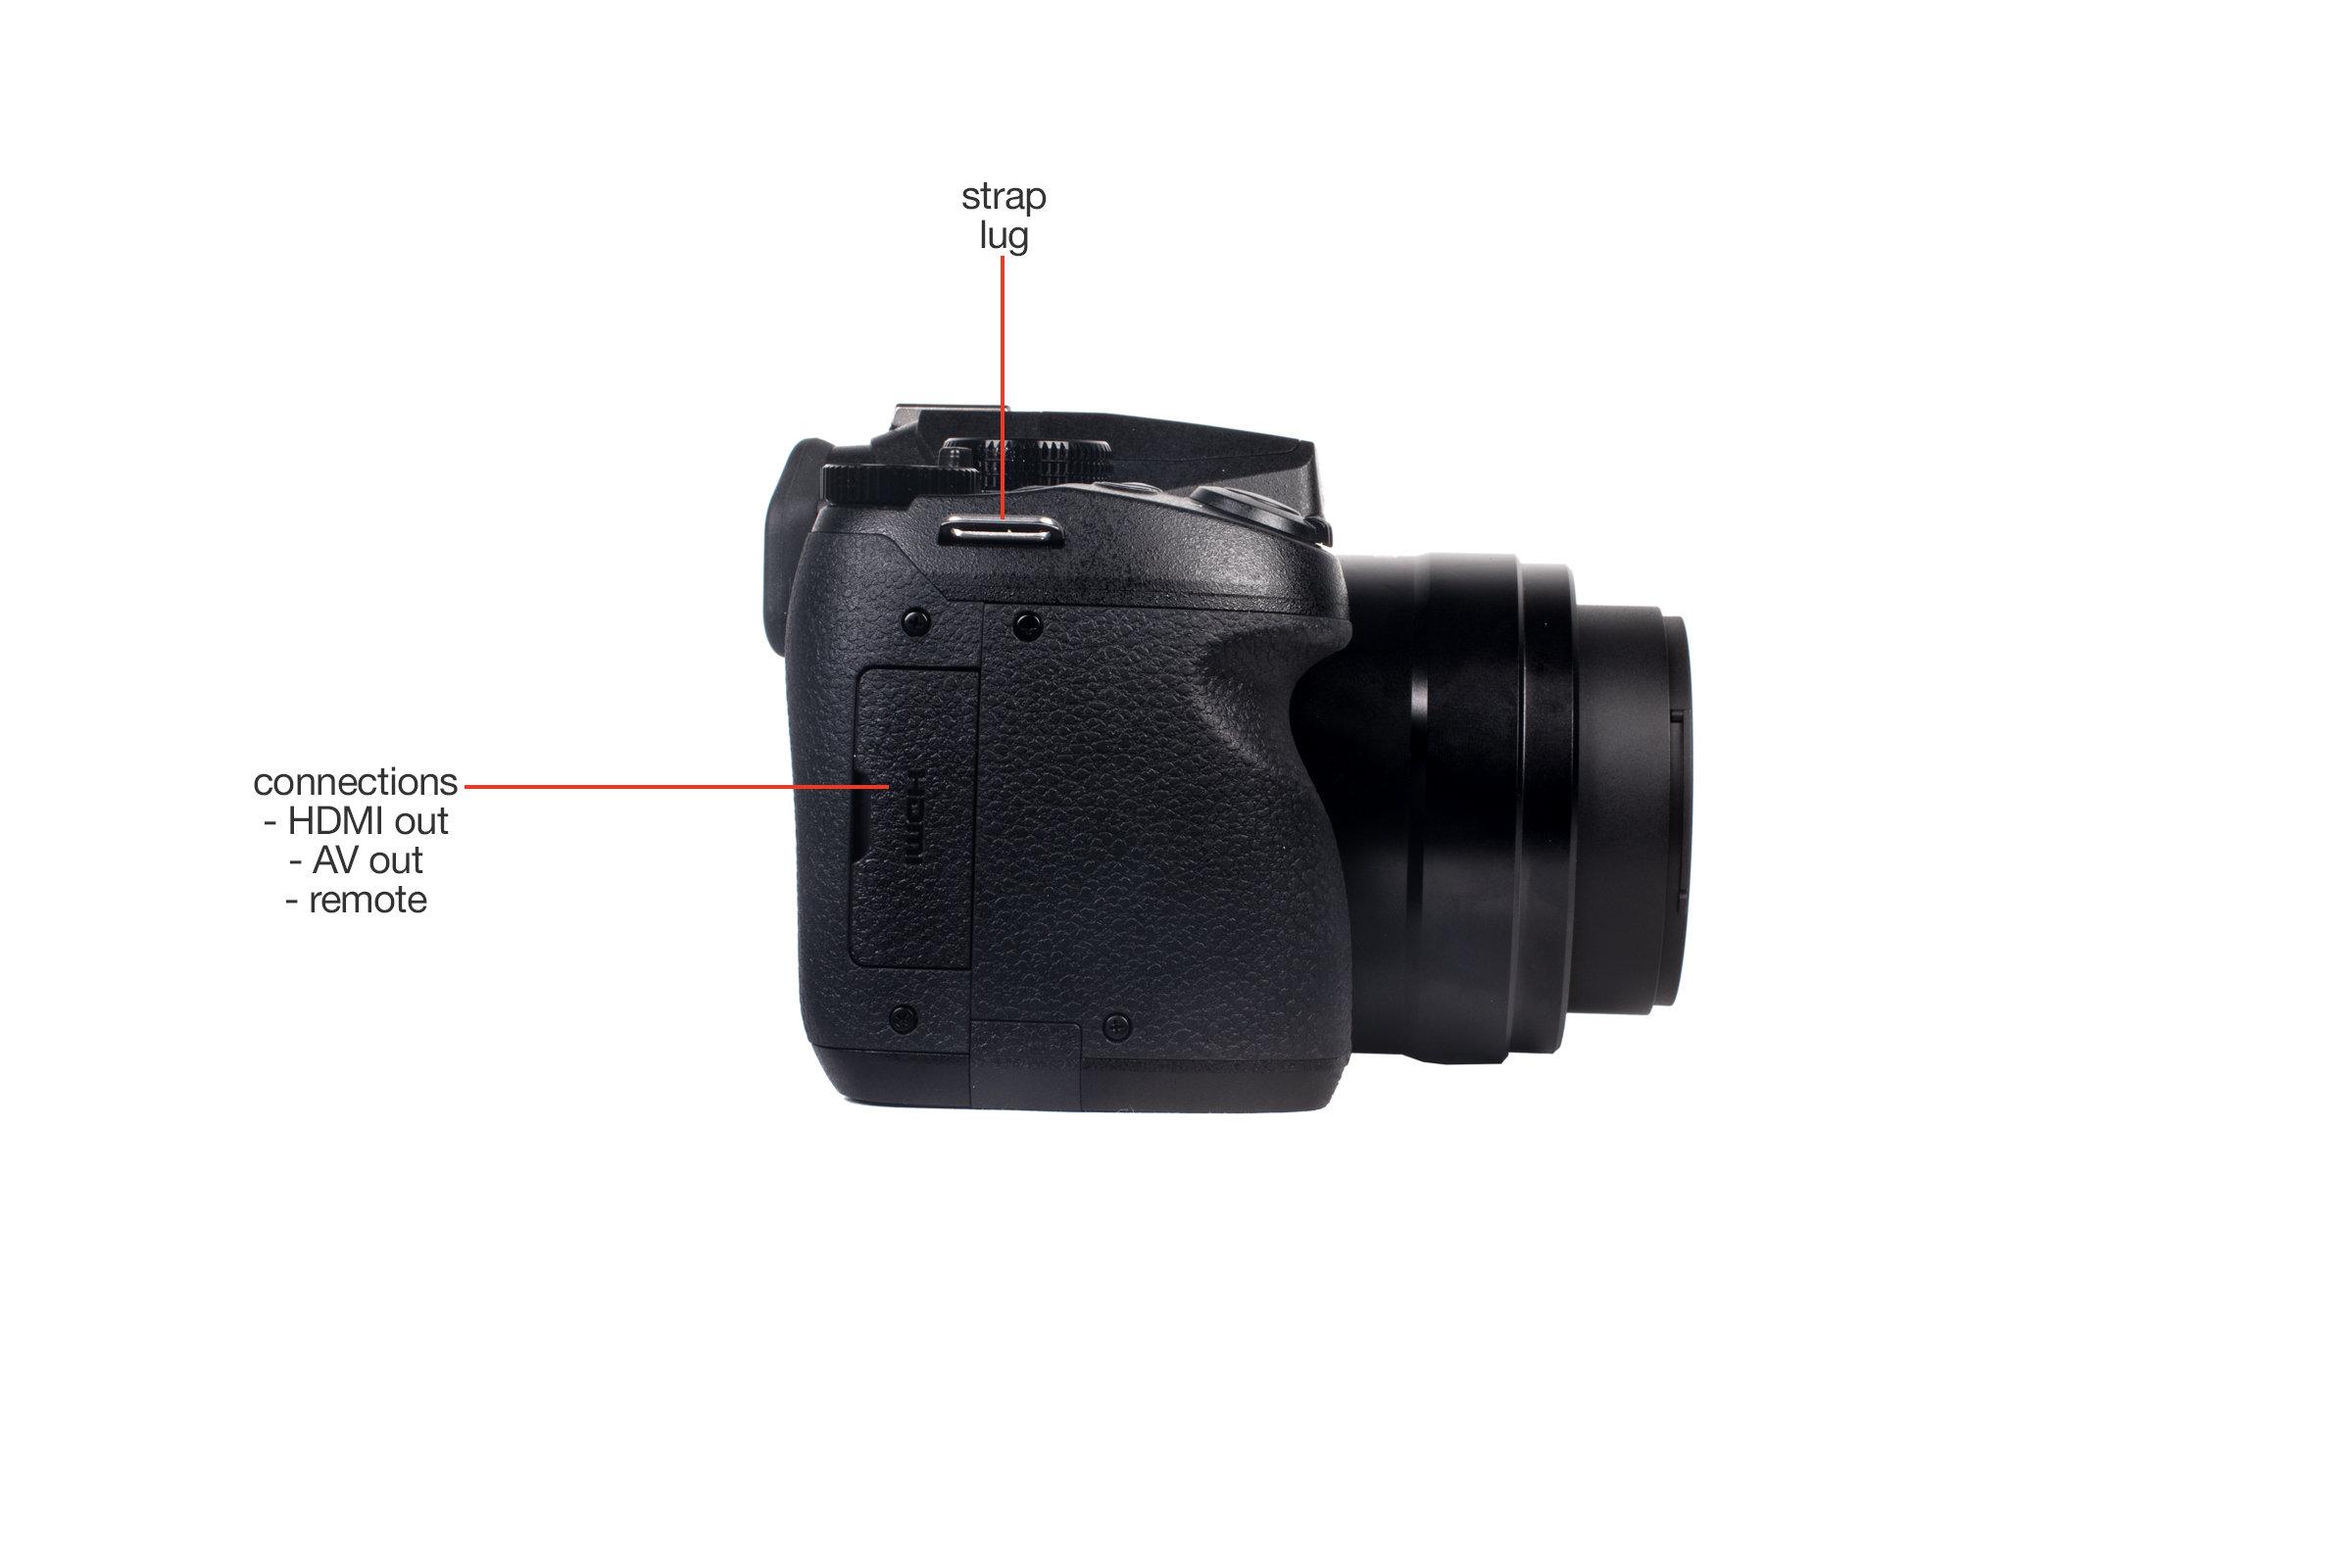 Right view of the Panasonic Lumix DMC-FZ300.